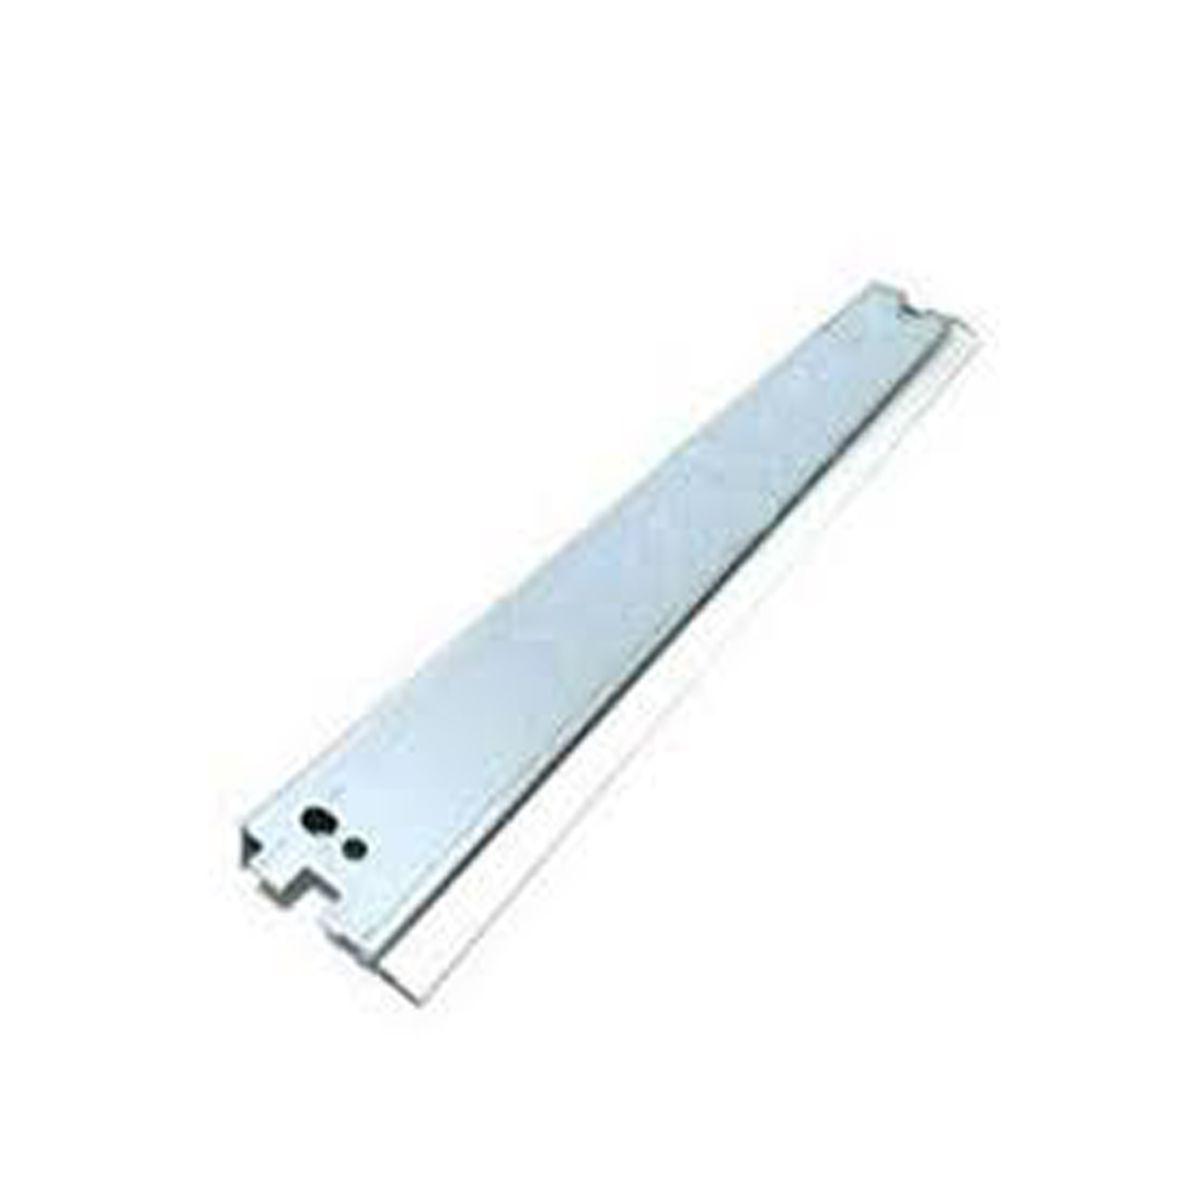 Lamina Limpeza Wiper Blade HP CB540 CB541 CB542 CB543 - CP1215 CP1515 1215 1515 CM1312